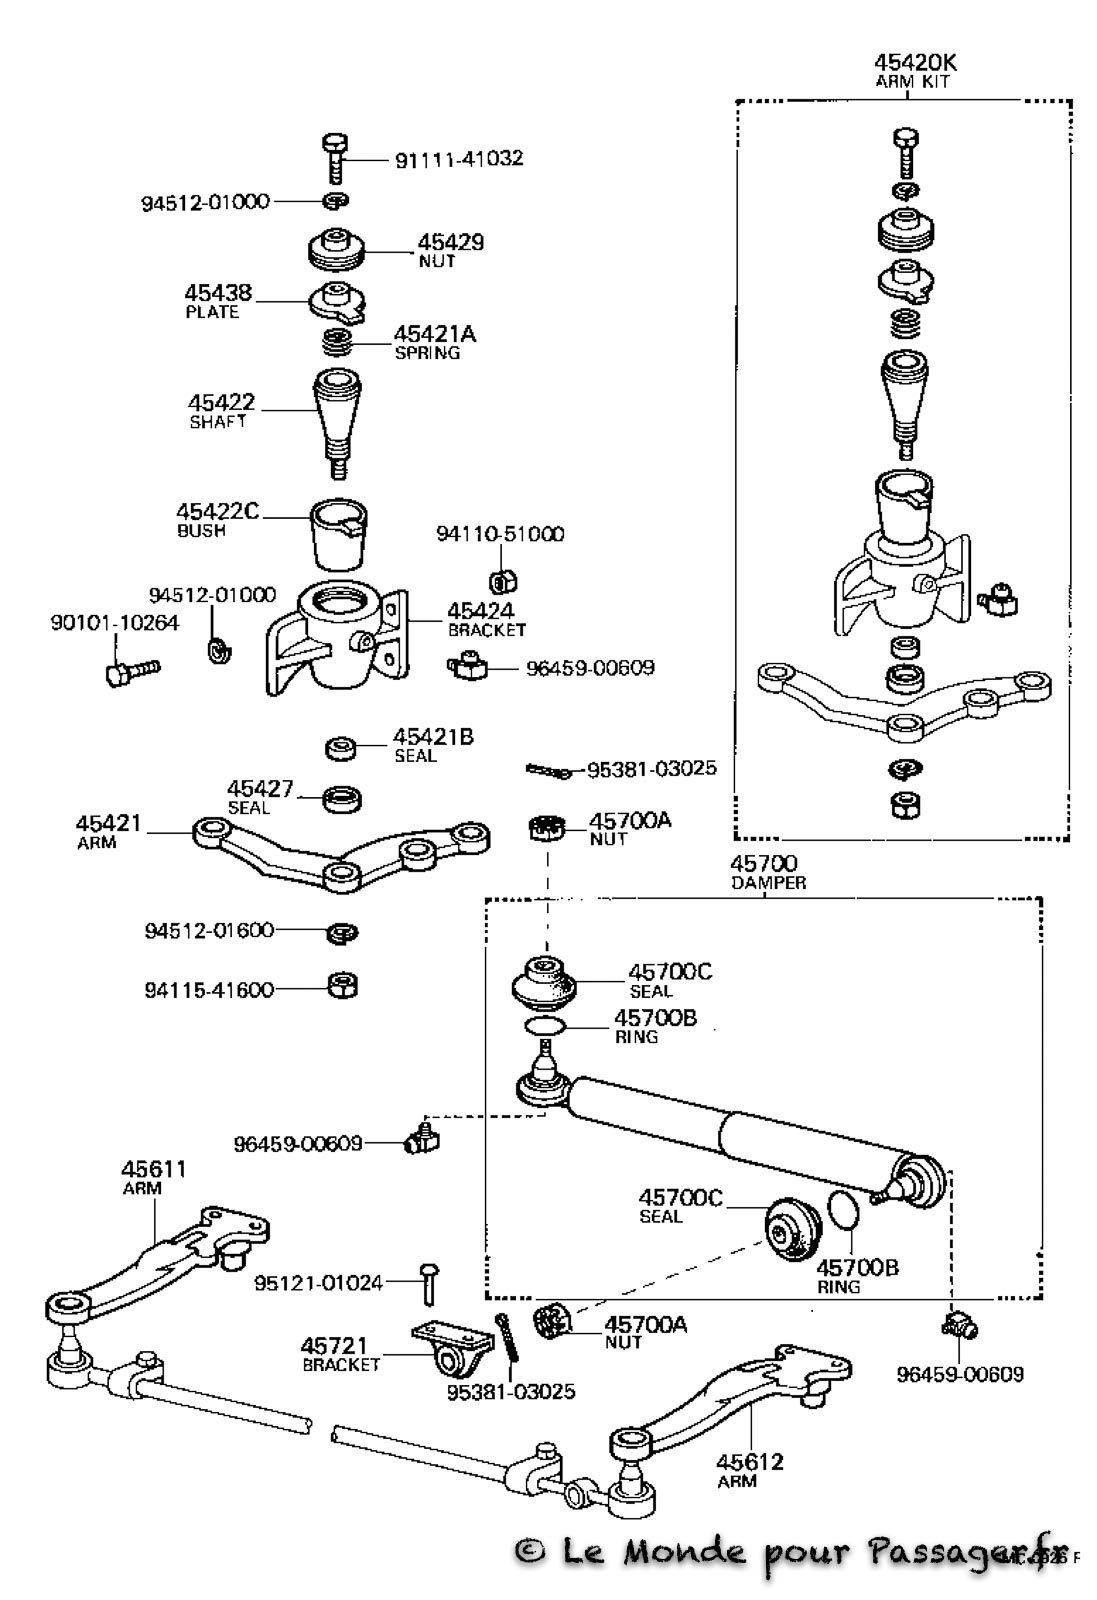 Fj55-Eclatés-Techniques131